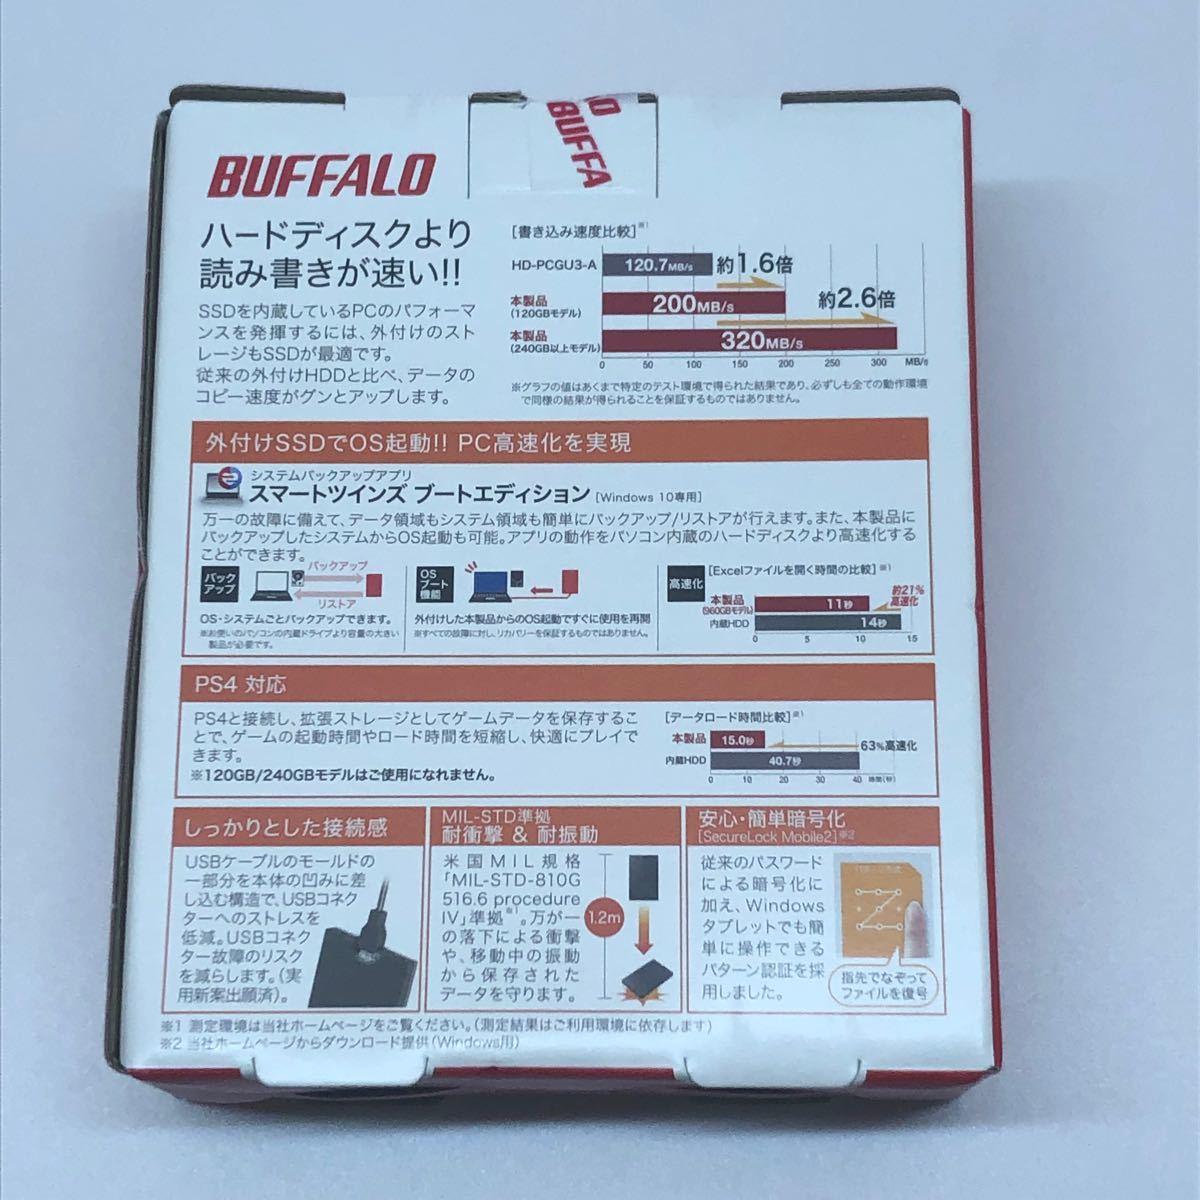 BUFFALO ポータブルSSD 480GB 新品未開封